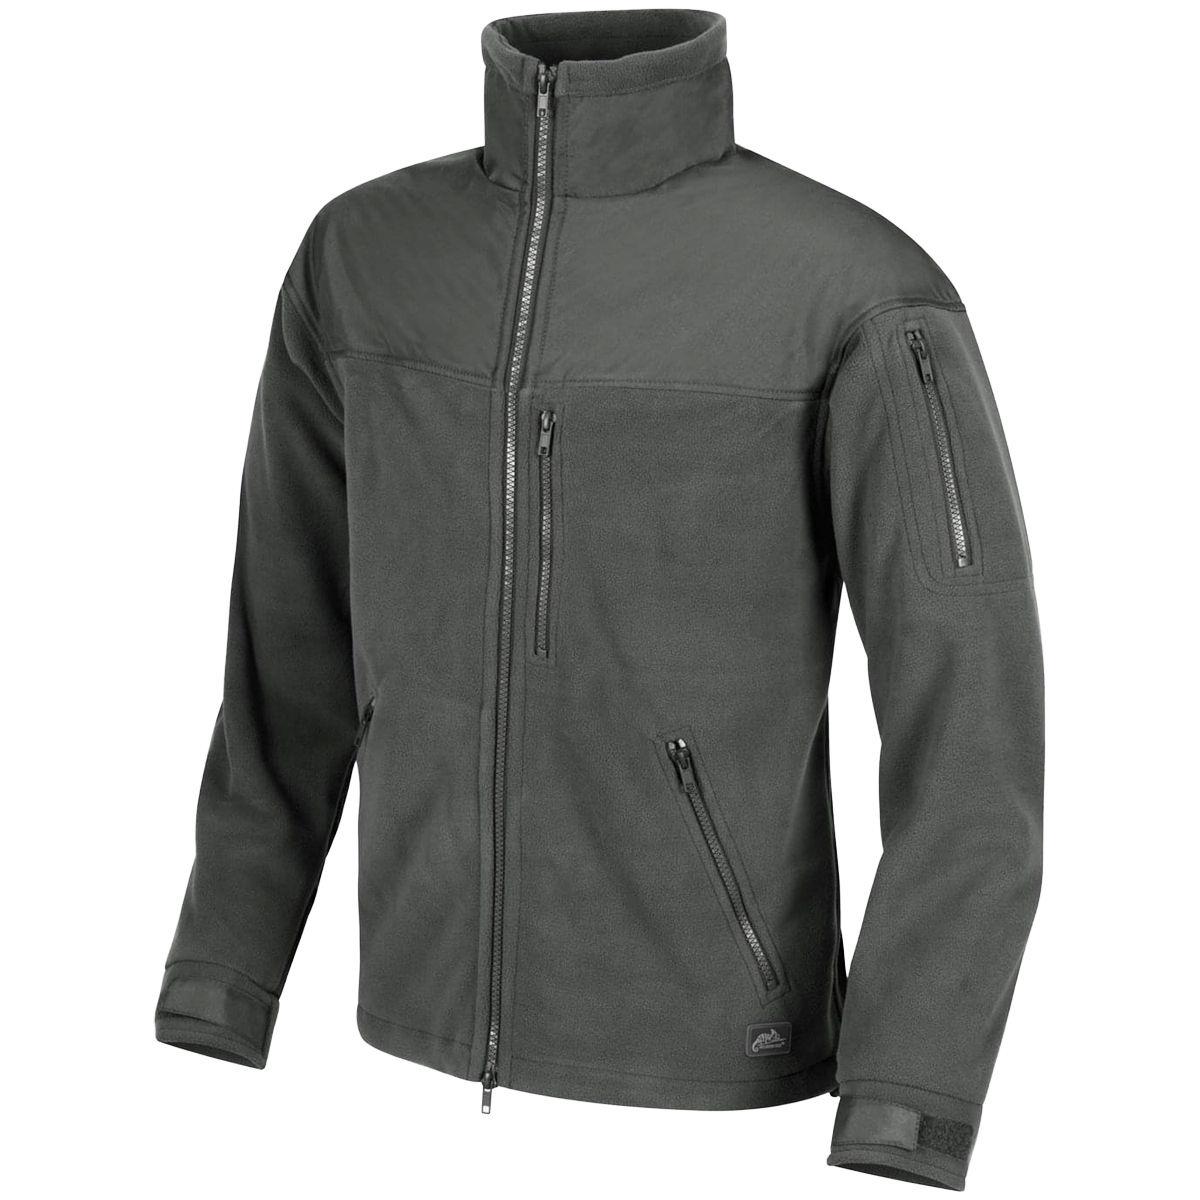 Helikon-Tex Classic Army Fleece Jacket    Coyote   /  Navy Blue  / Shadow Grey / Olive